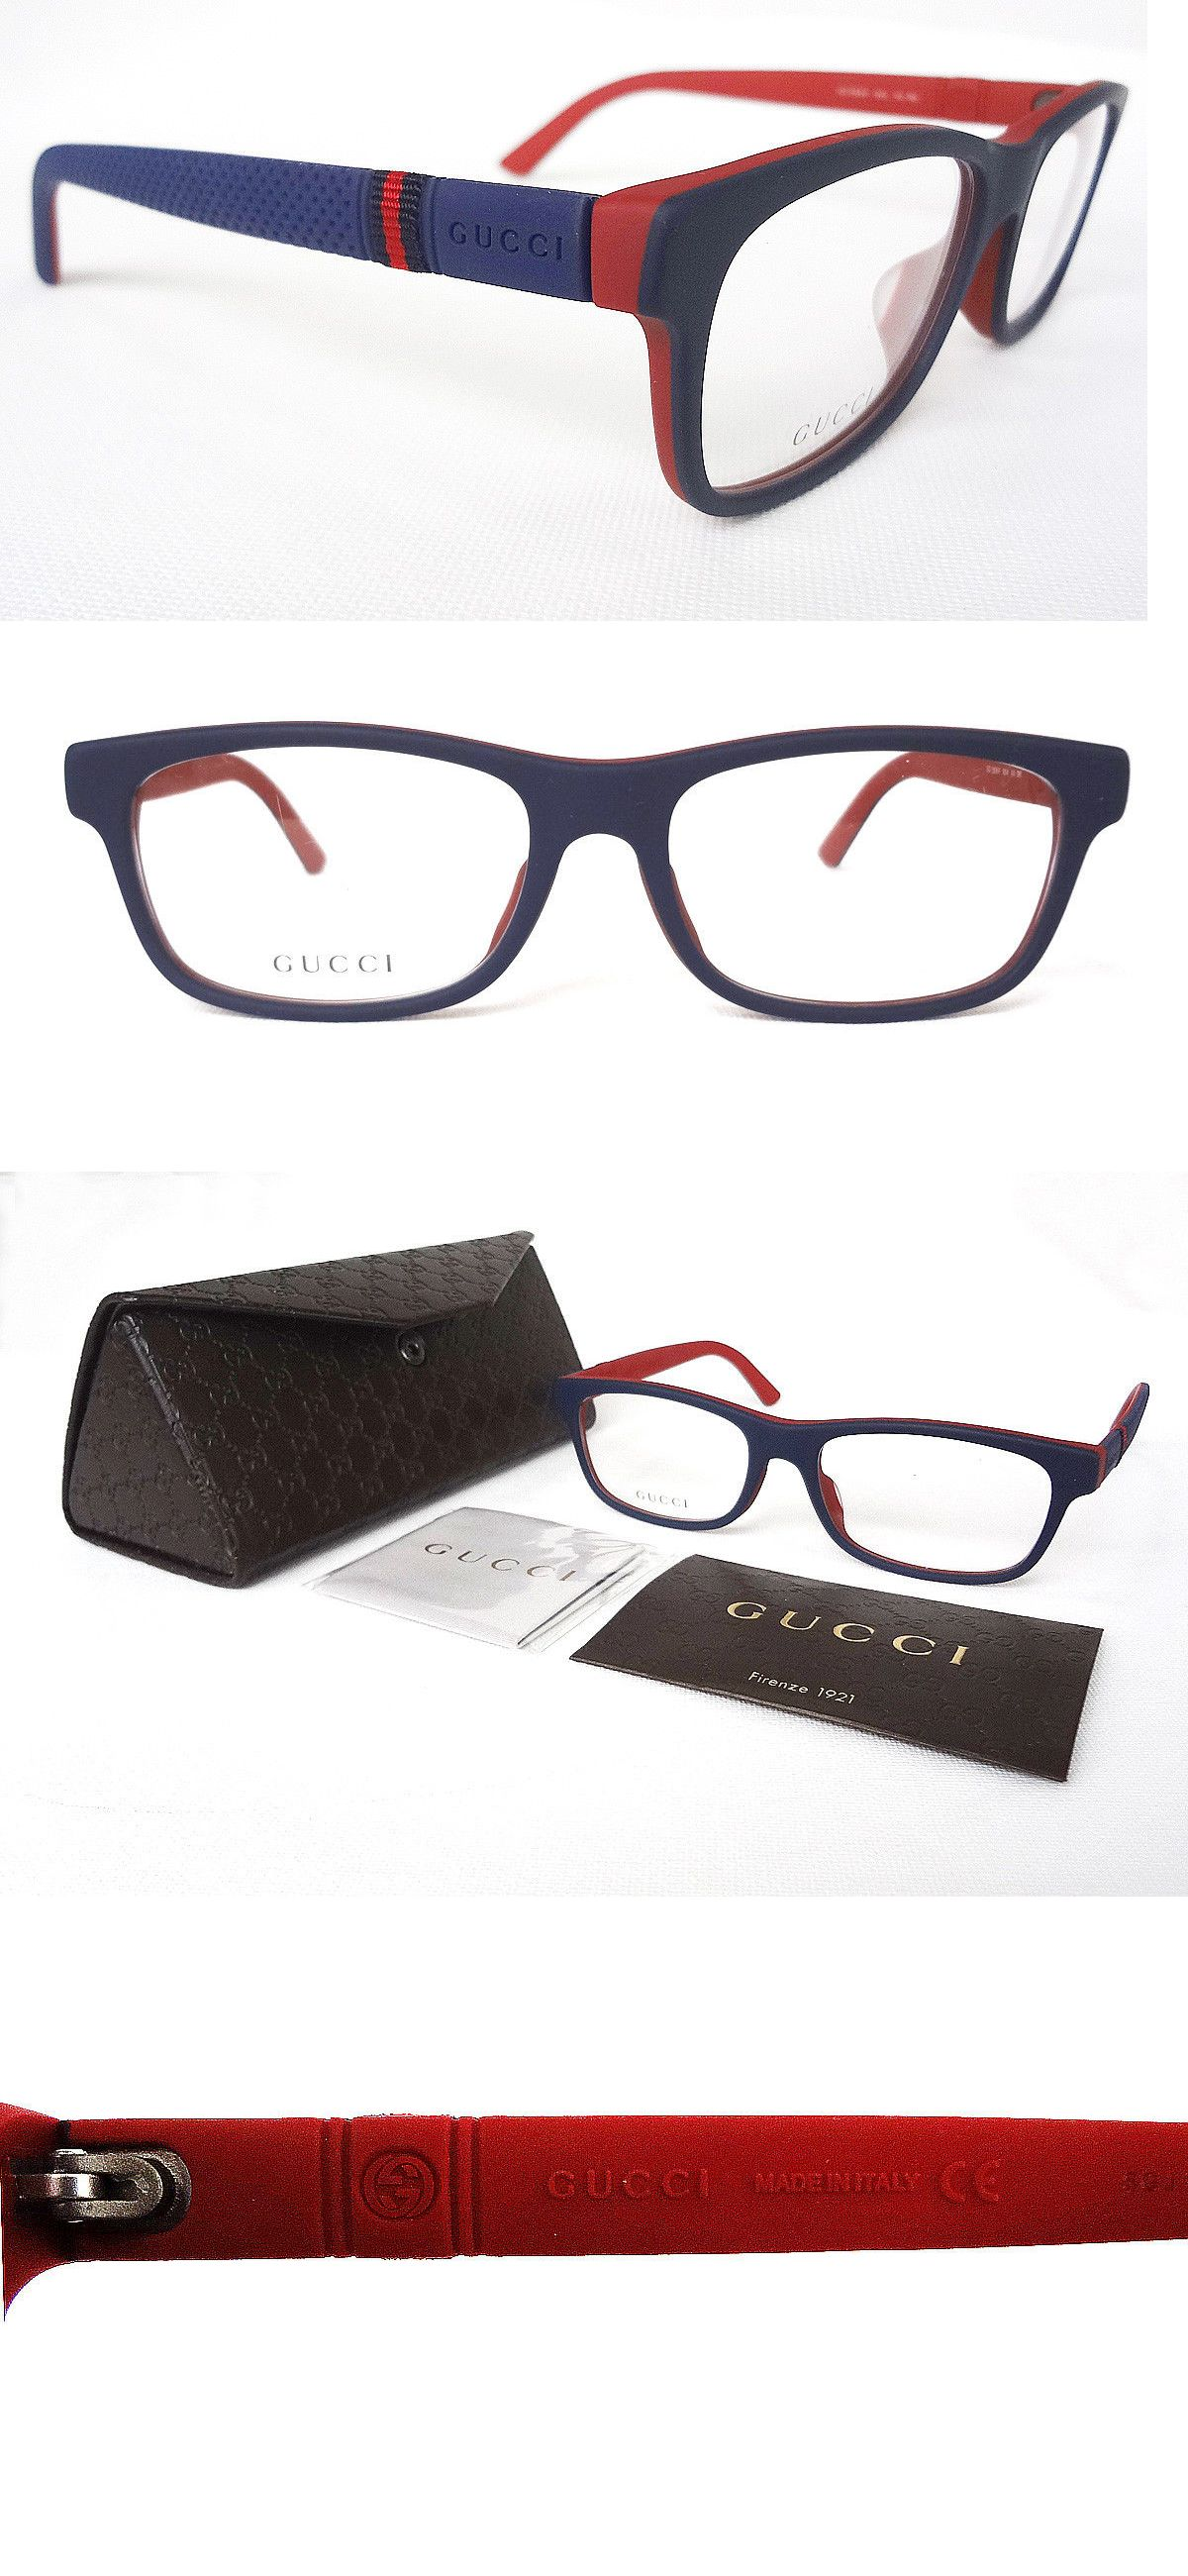 7b80c3a700 Eyeglass Frames 180957  Gucci Men S Frame Glasses Gg9108 F Blue Red 54-17